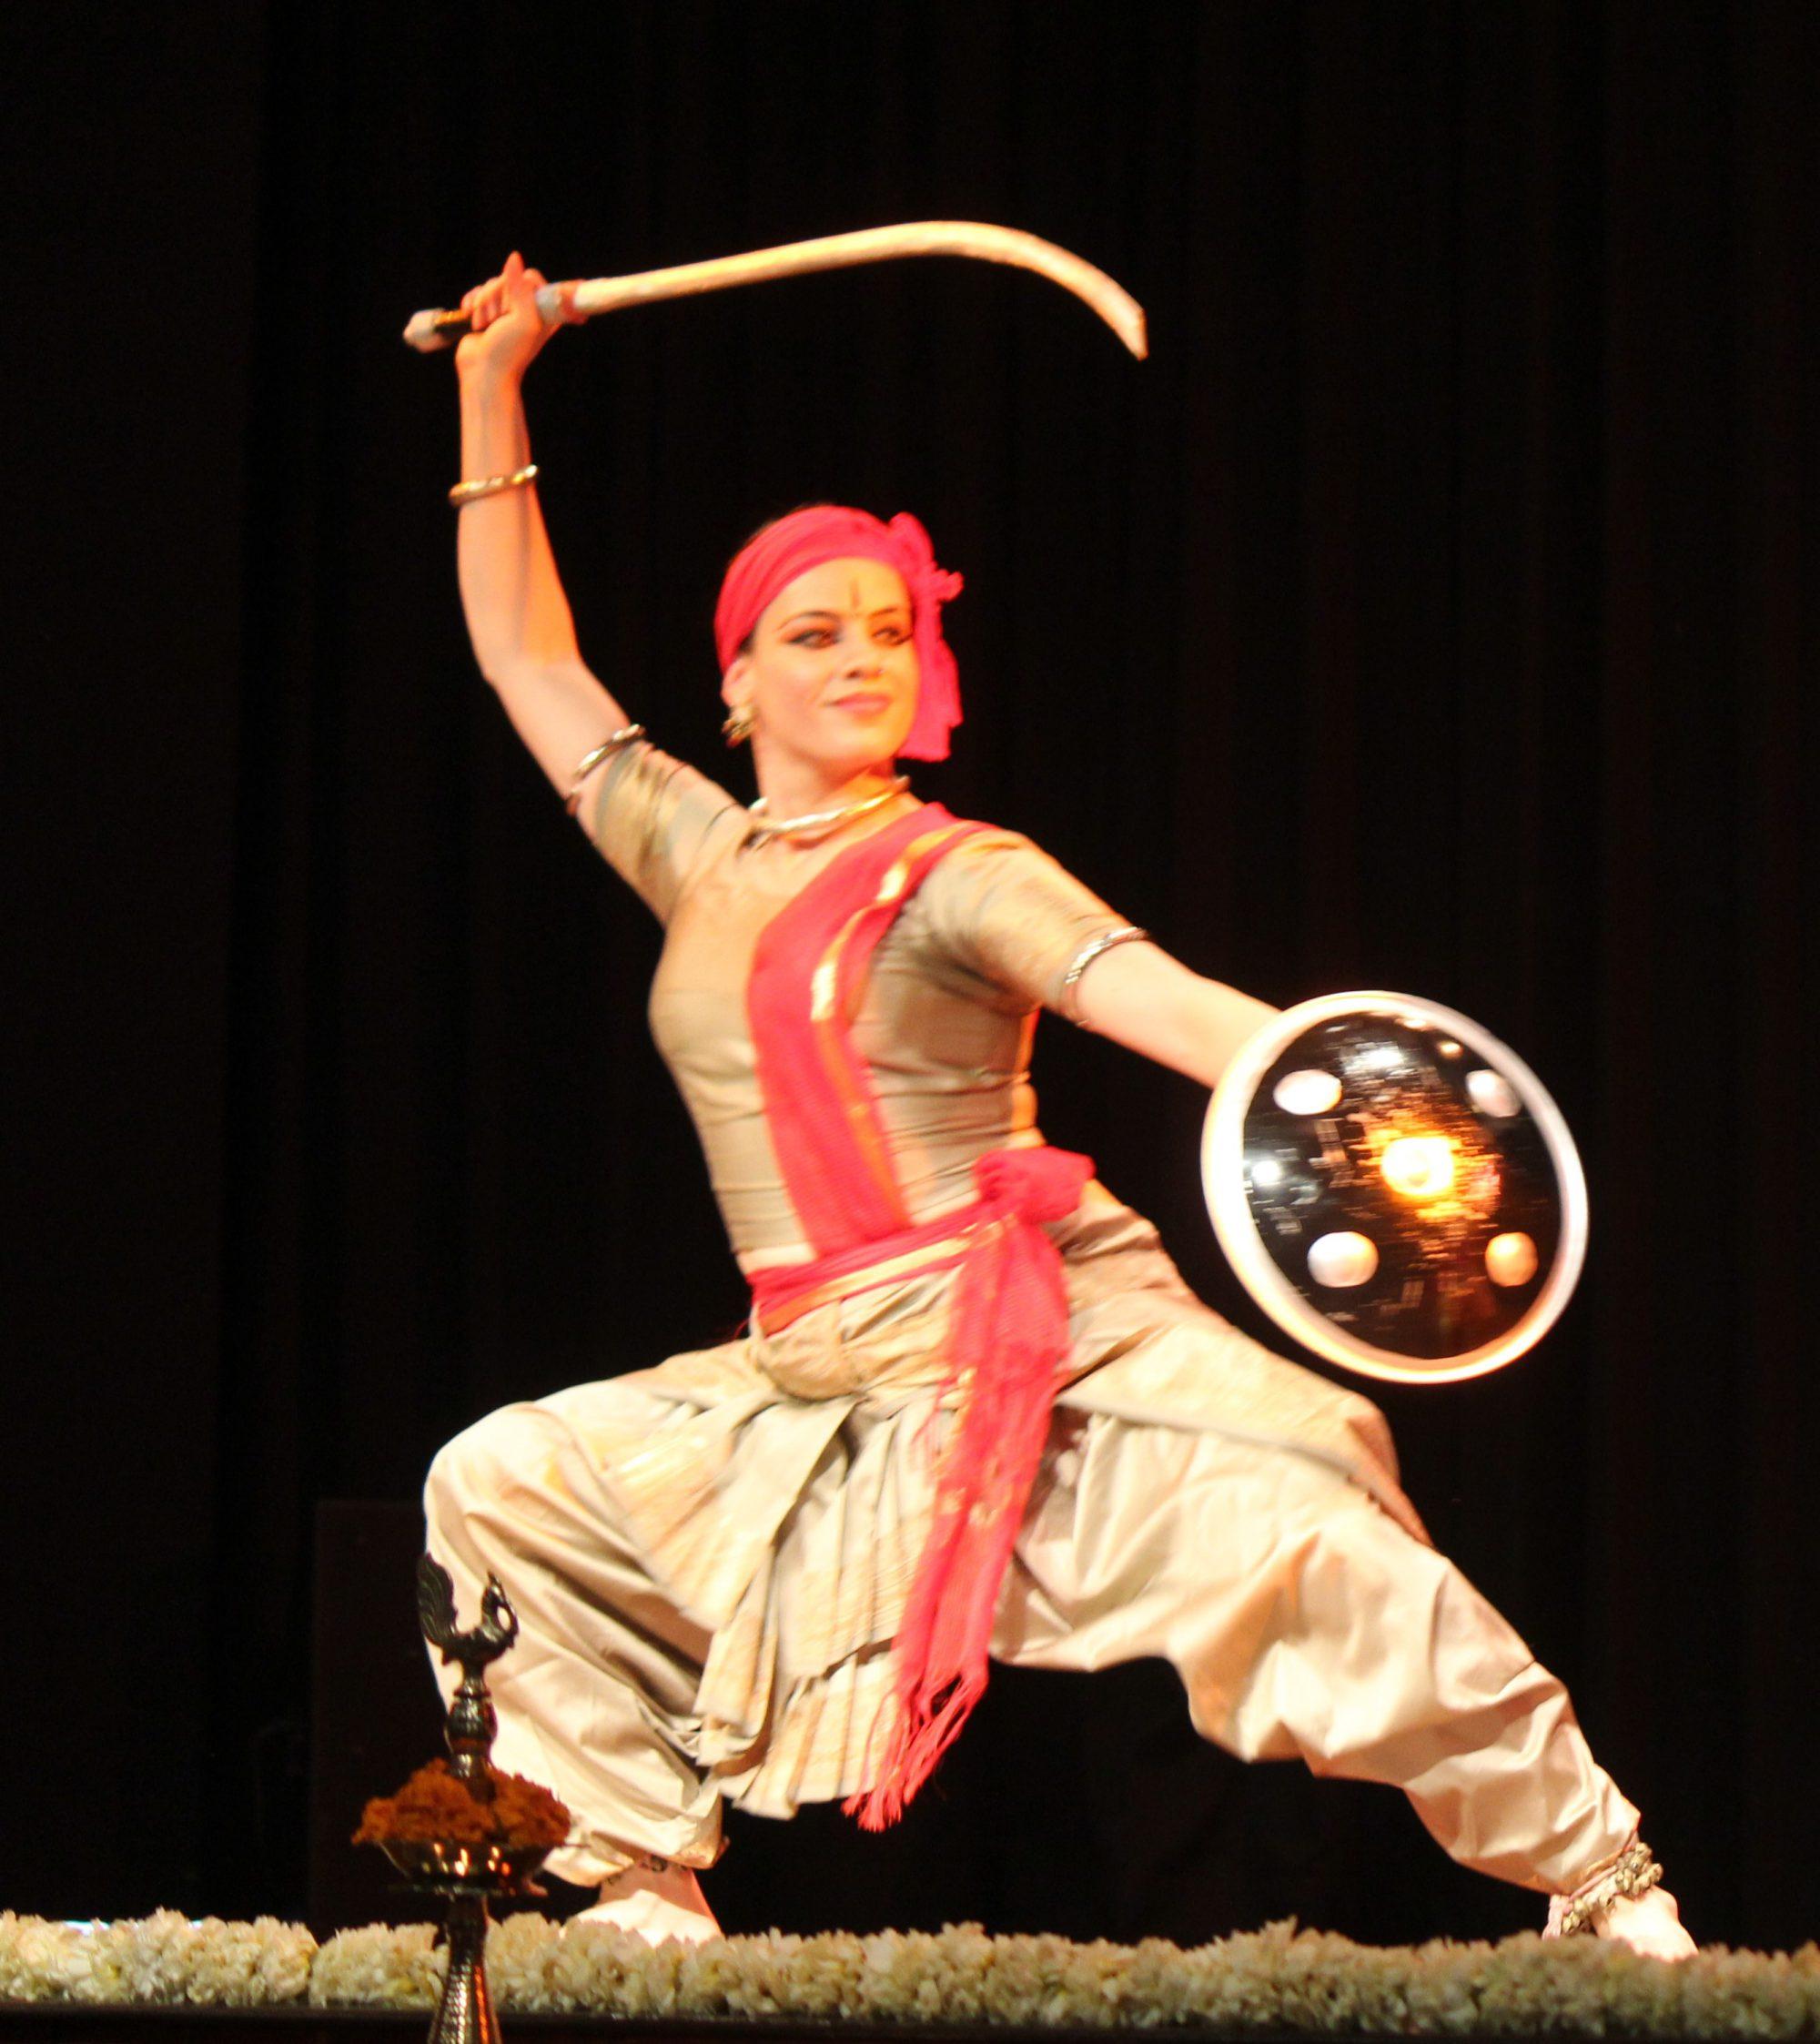 mayurbhanj chhau